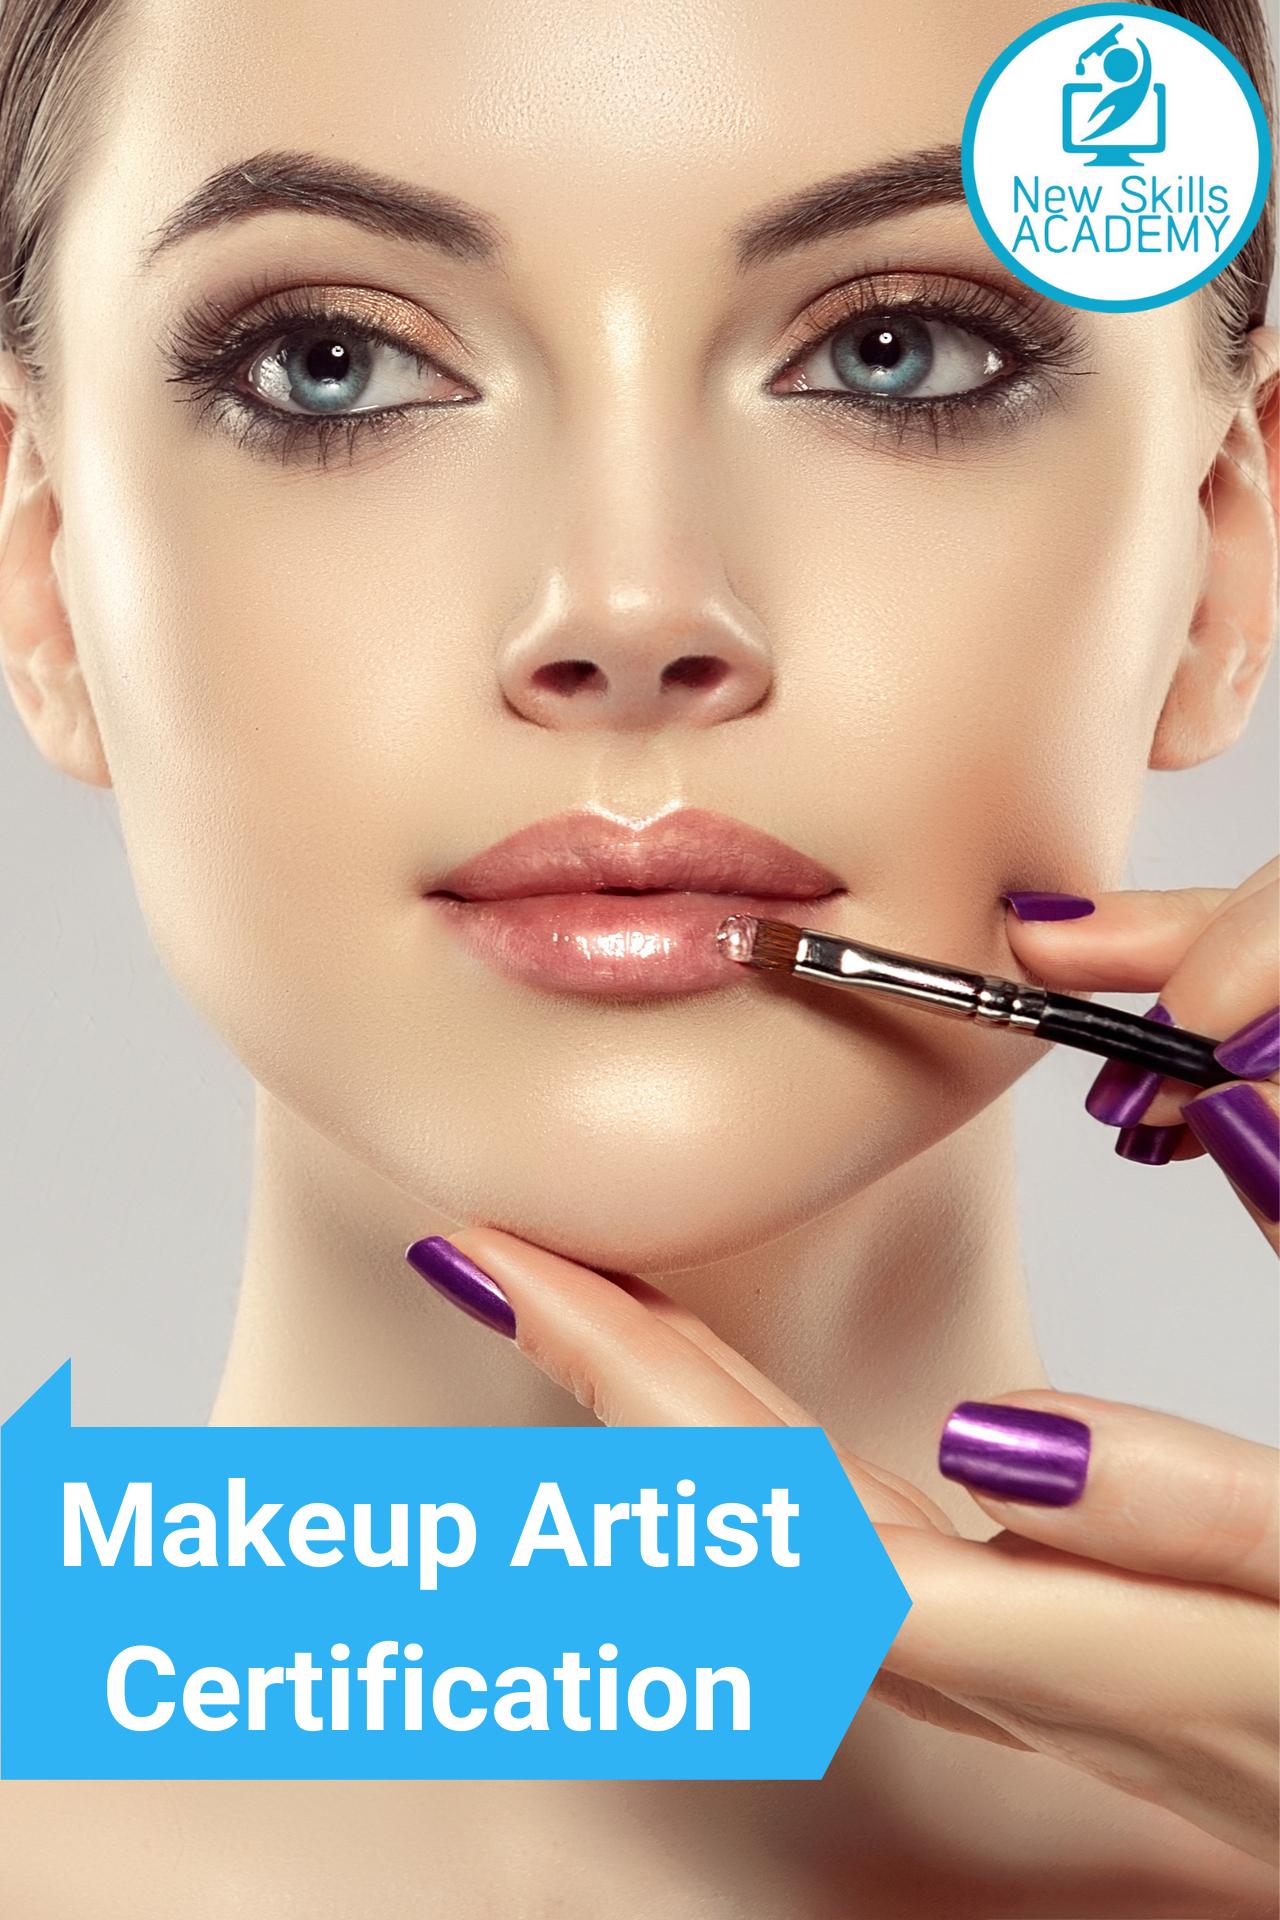 Makeup Artist Certification Only 26 Usd In 2020 Makeup Artist Certification Makeup Ysl Makeup Foundation